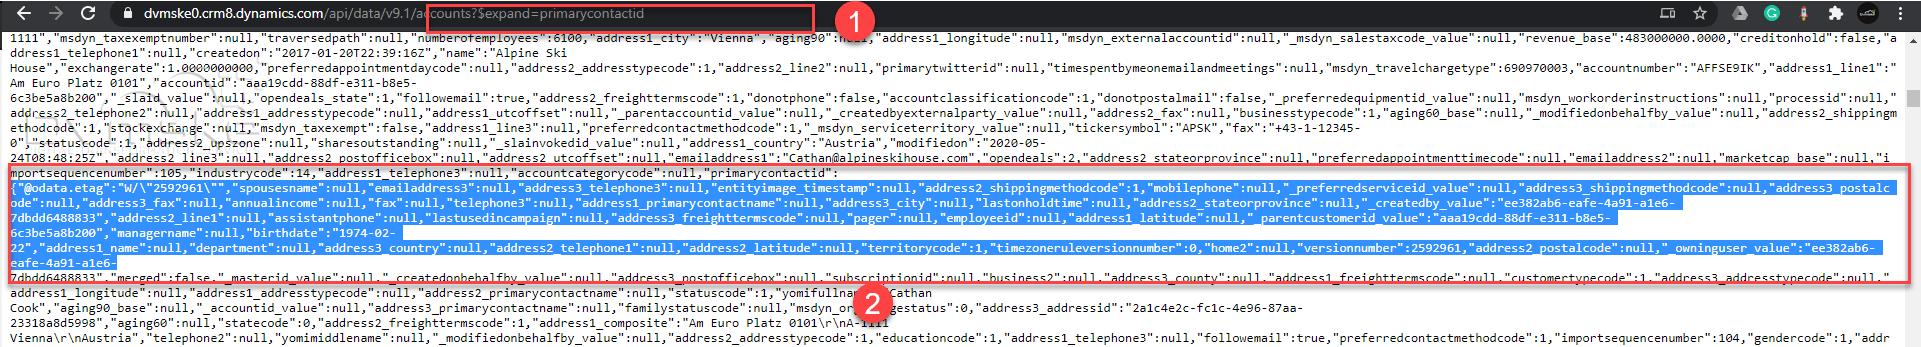 https://i0.wp.com/microsoftdynamics.in/wp-content/uploads/2020/06/img_5ee5ebe409d7e.png?fit=1921%2C347